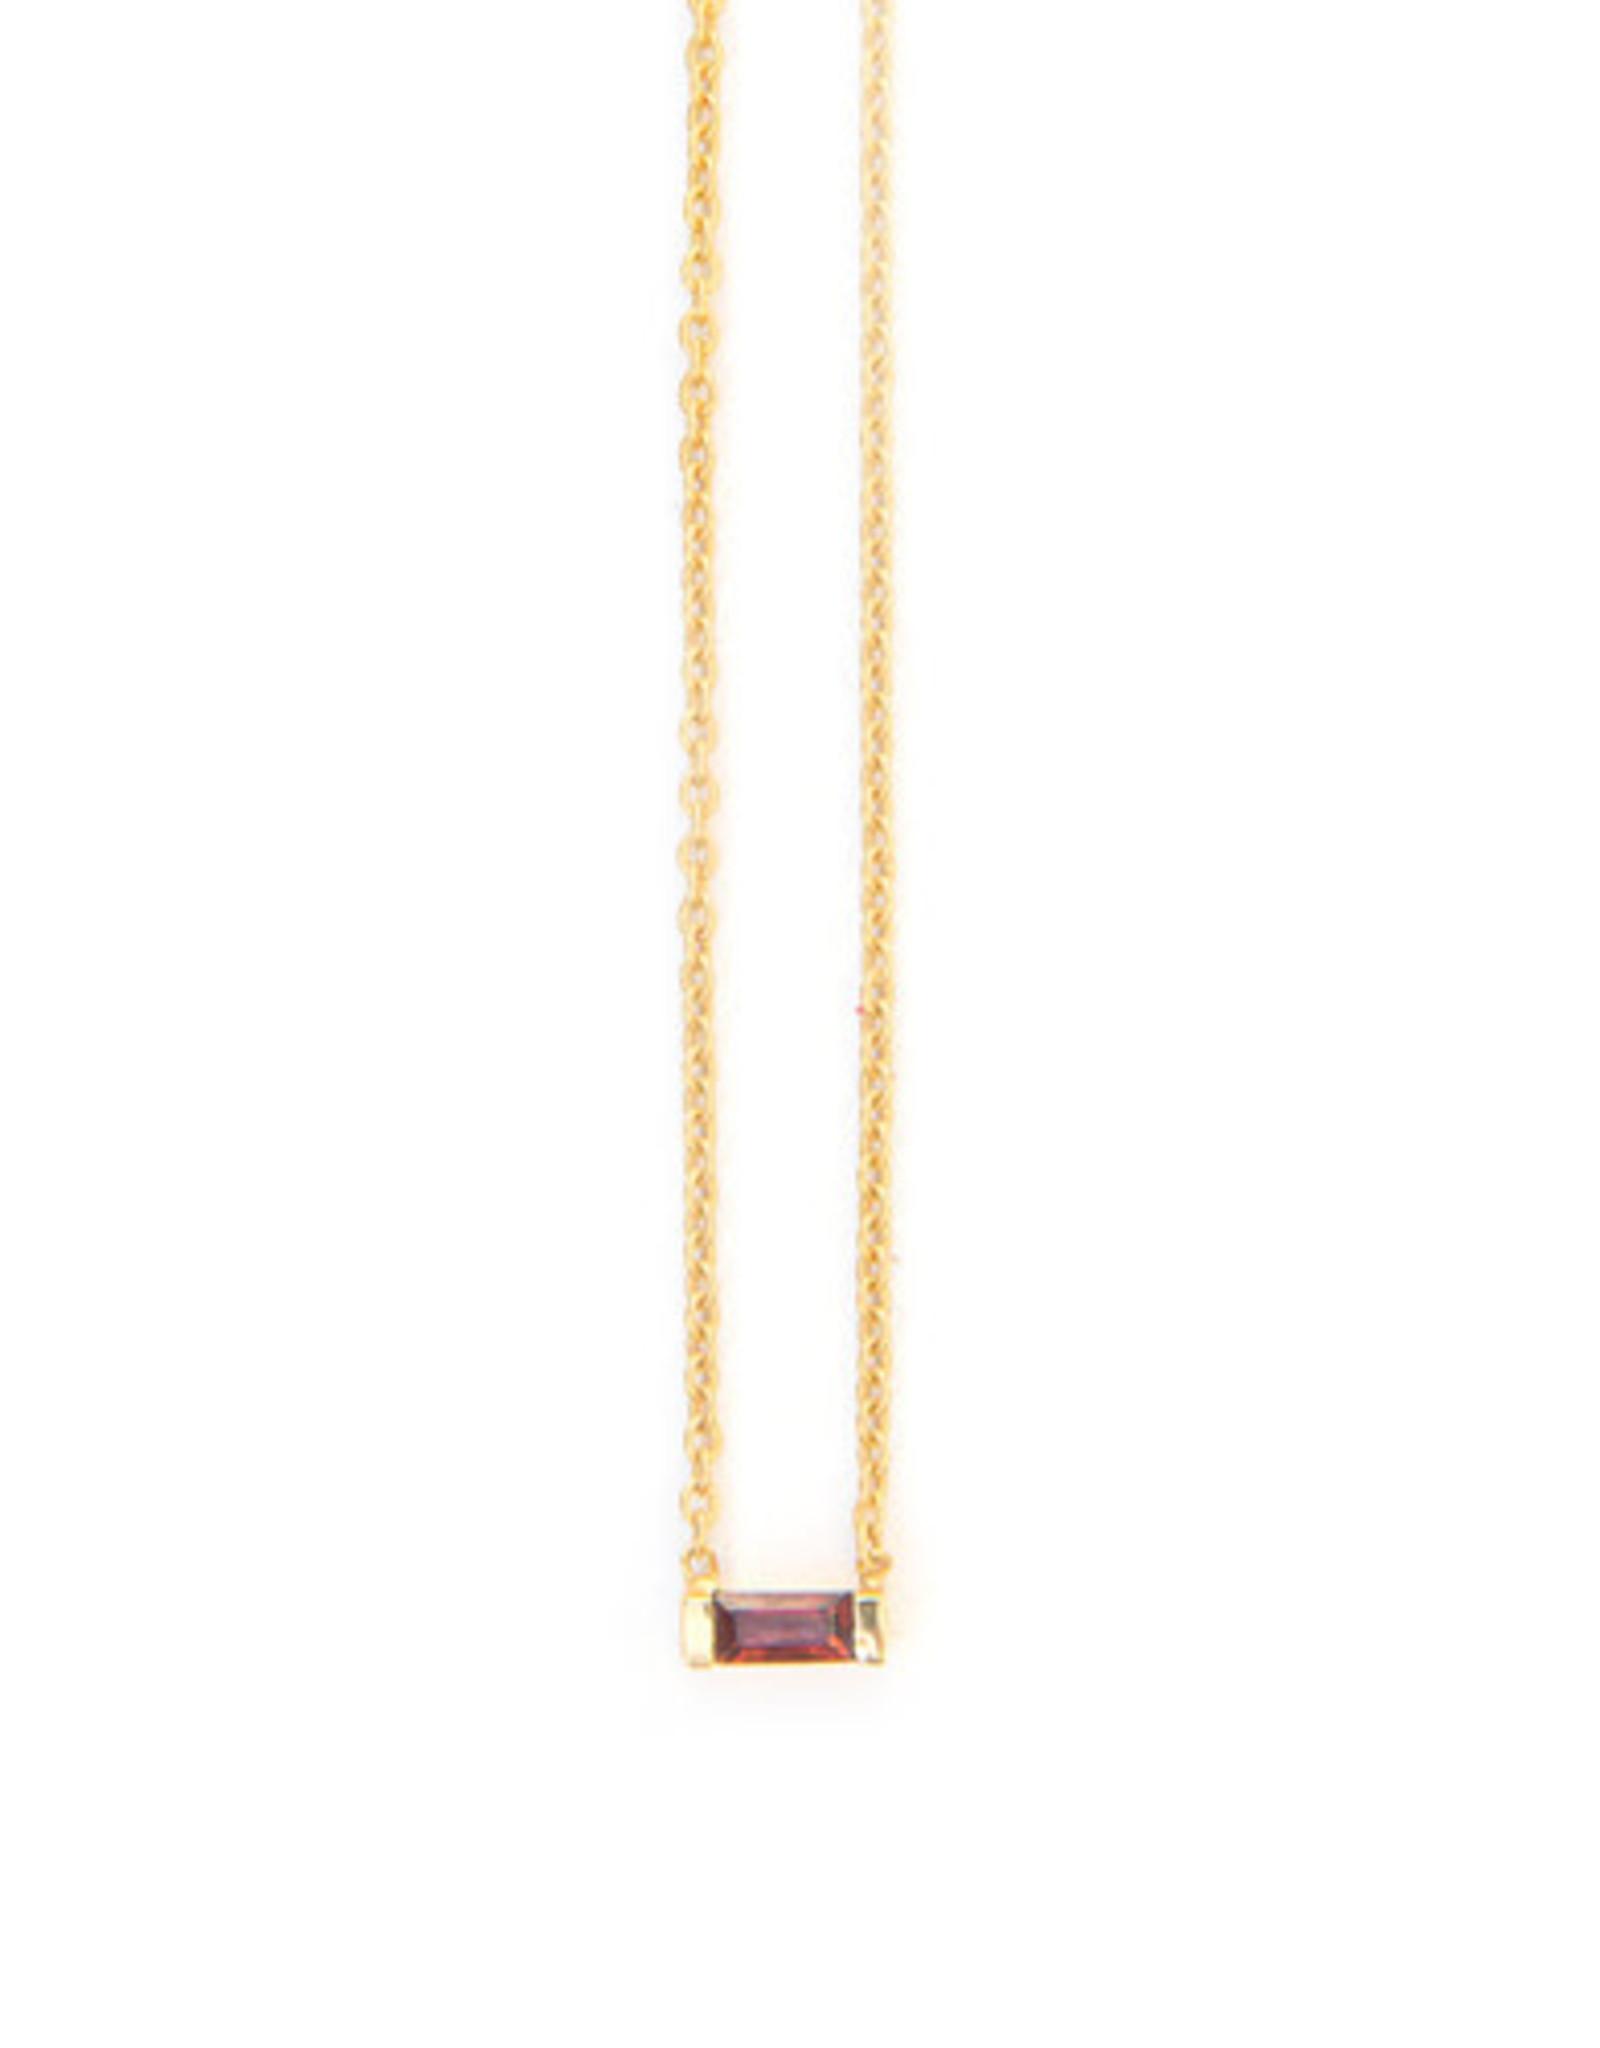 Prism Brass Necklace, Garnet, India